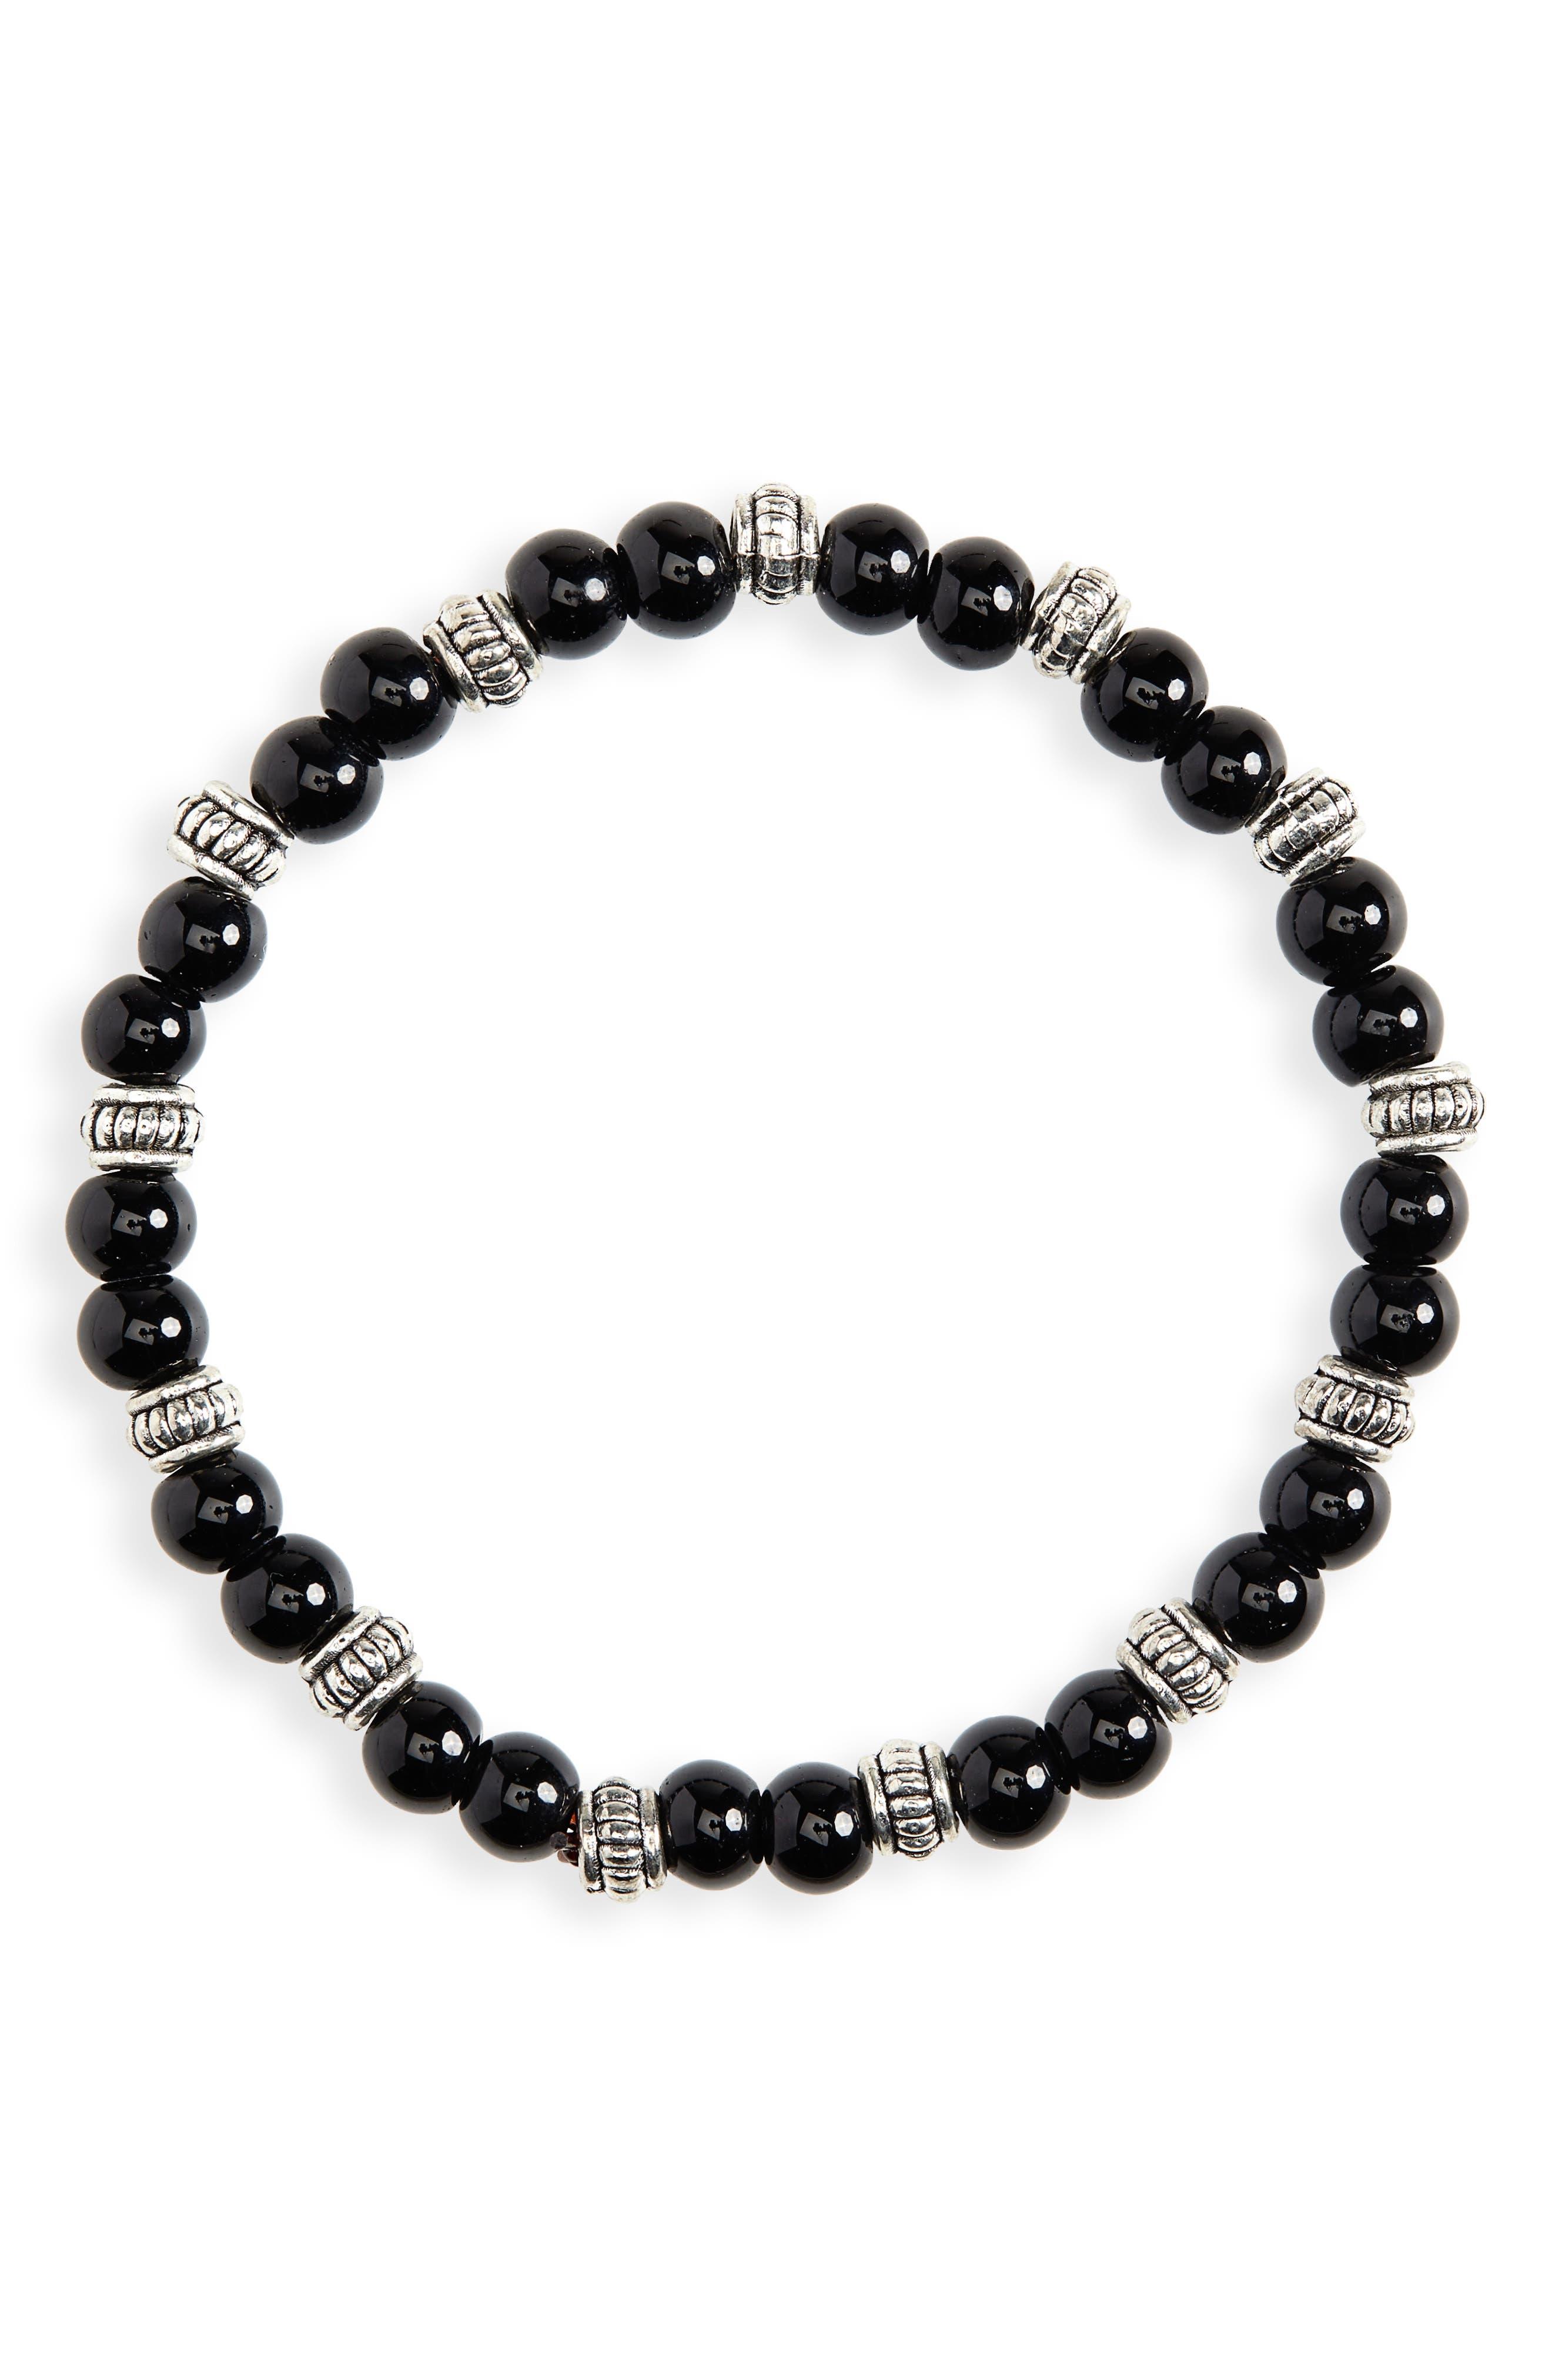 NORDSTROM MEN'S SHOP, Beaded Bracelet, Main thumbnail 1, color, BLACK/ SILVER